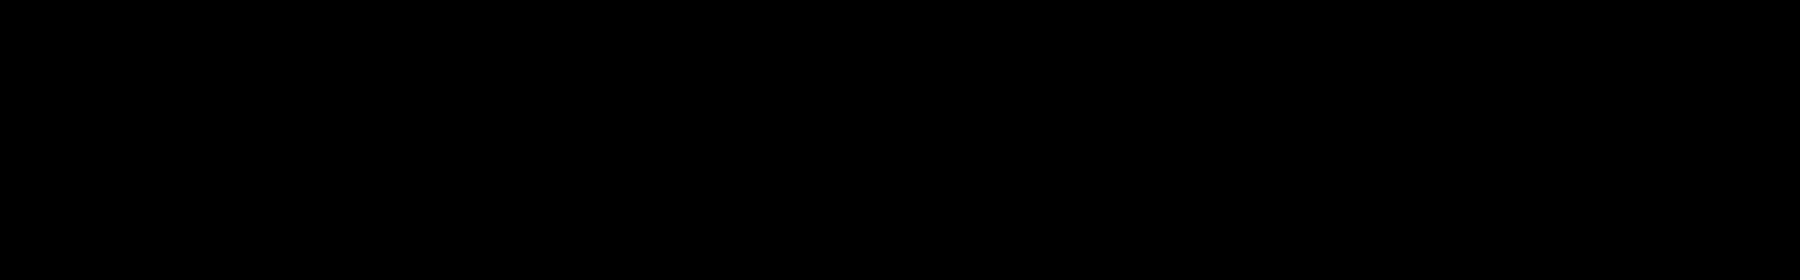 Plata O Plomo audio waveform